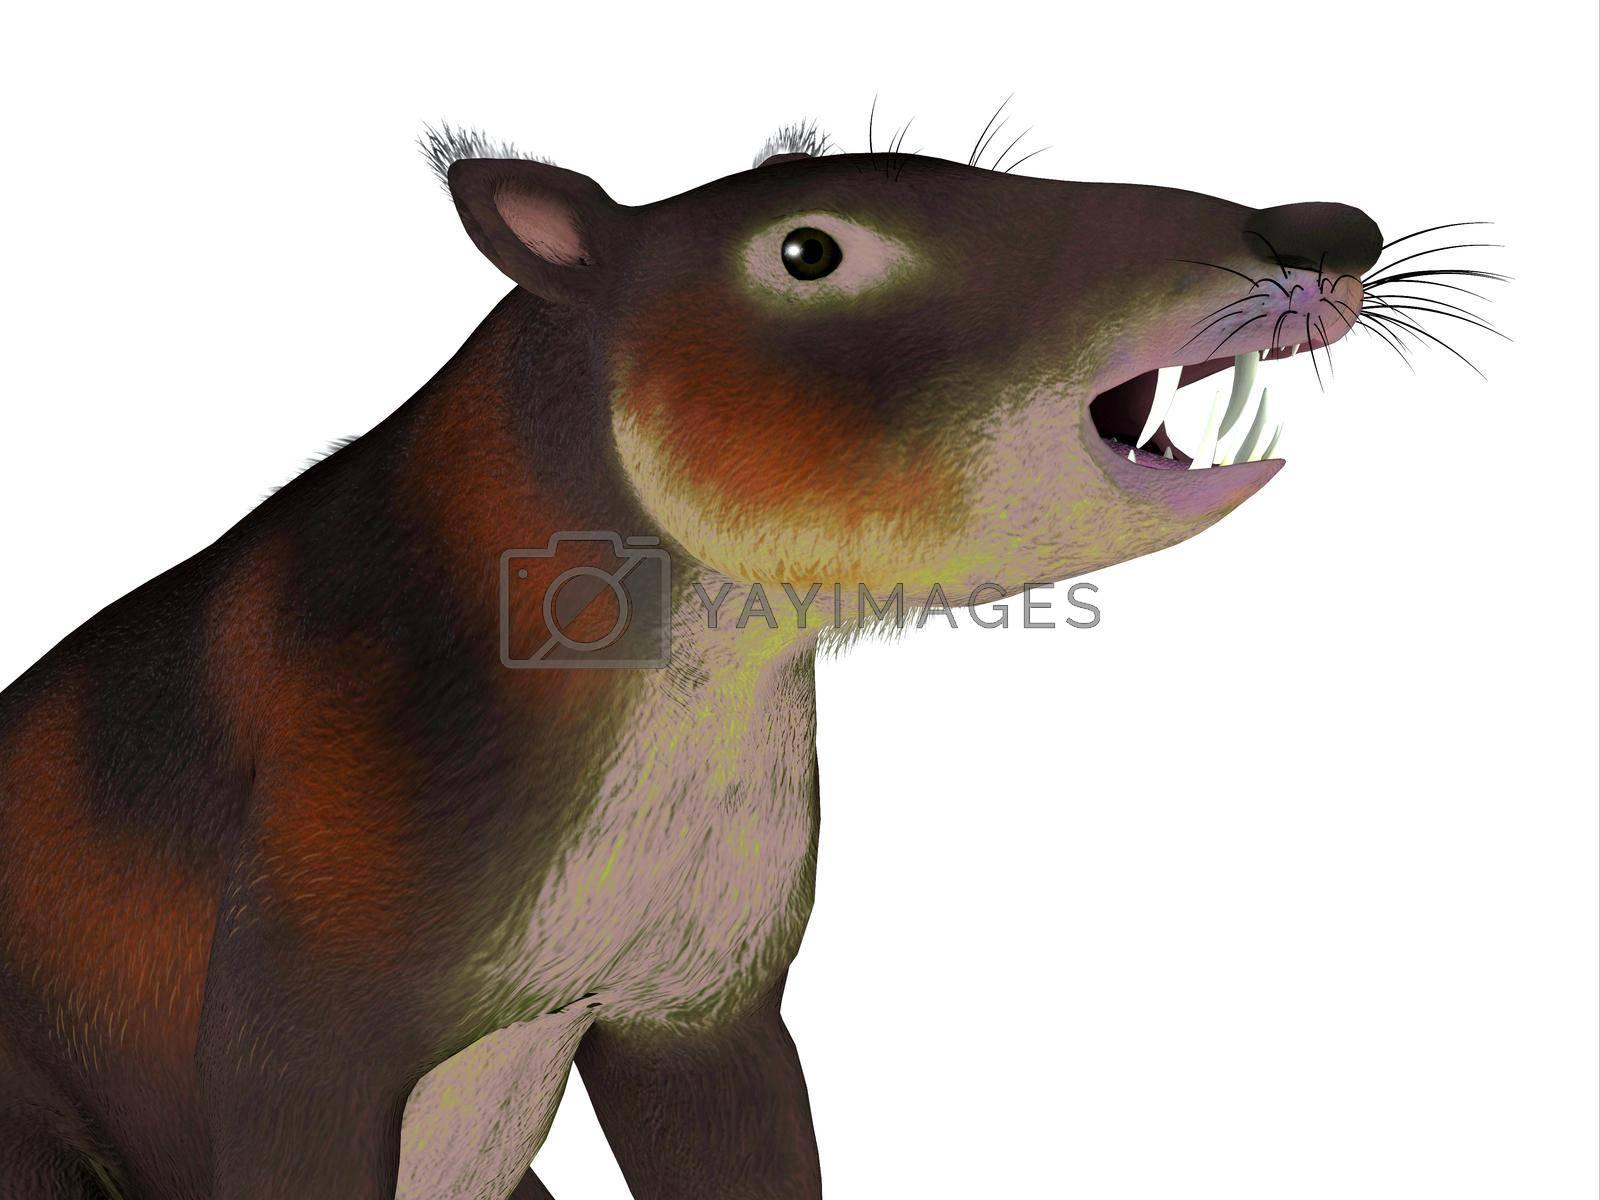 Royalty free image of Cronopio Mammal Head by Catmando